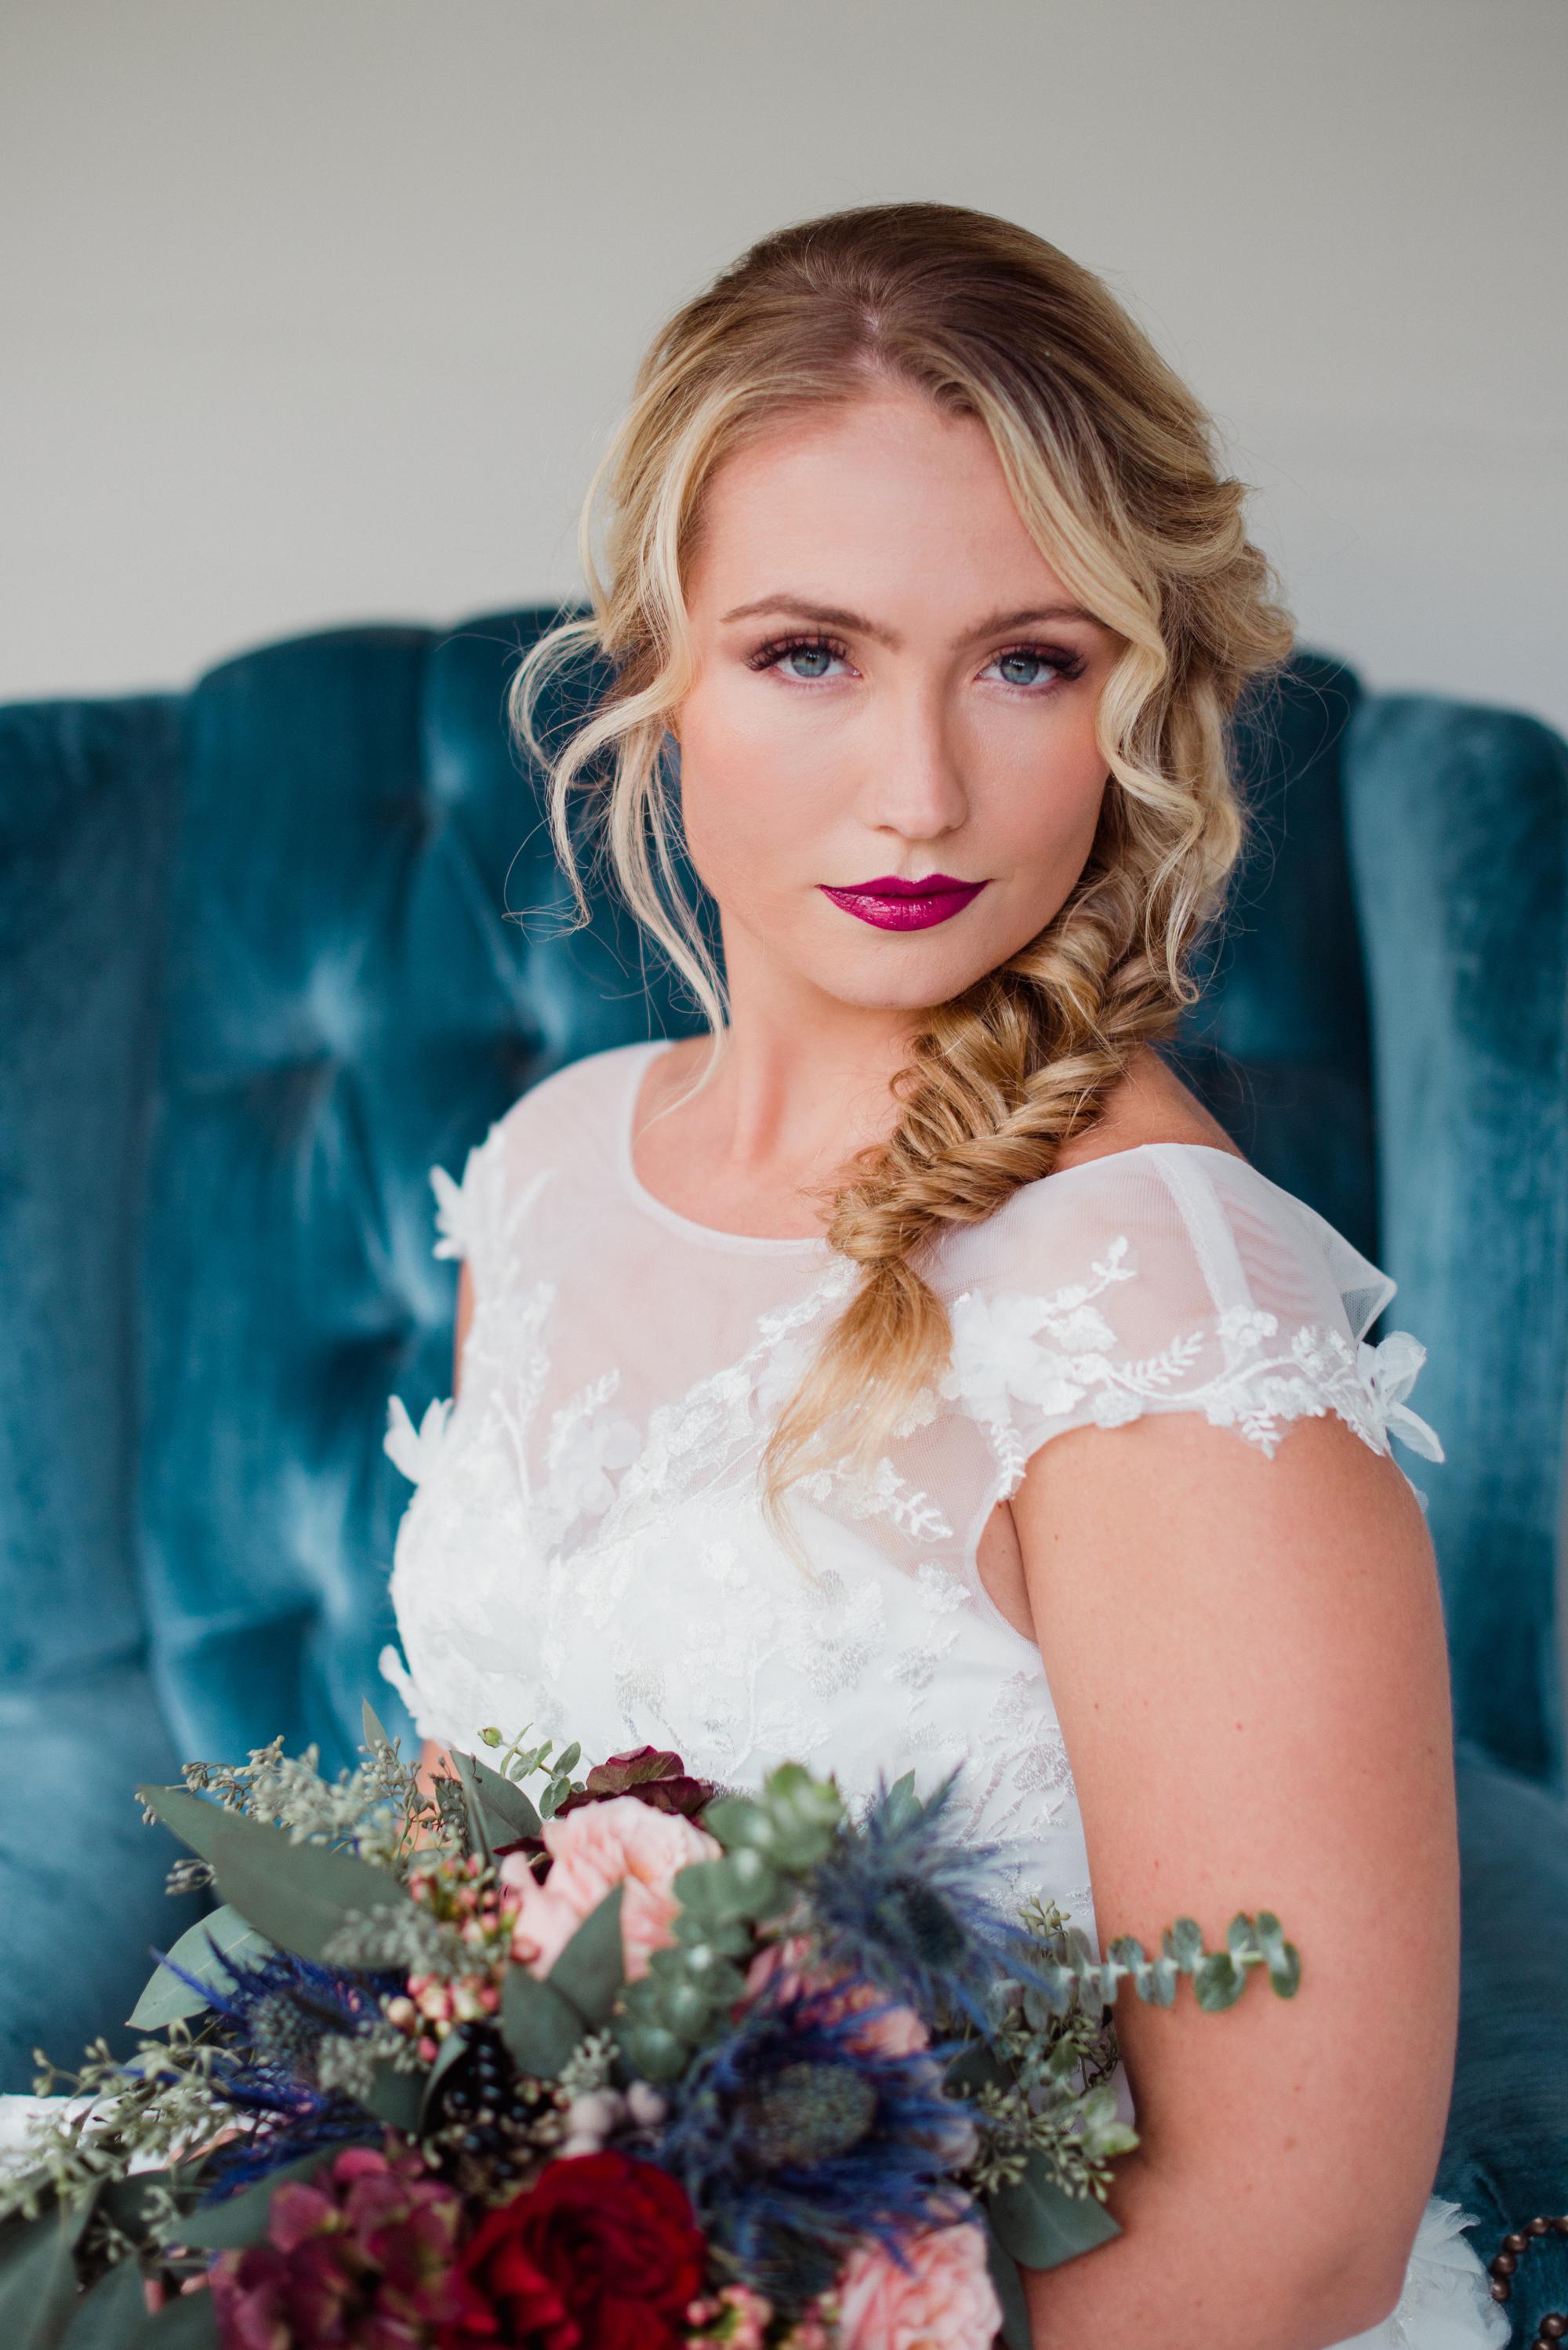 wedding photo idea bride photo inspiration velvet chair